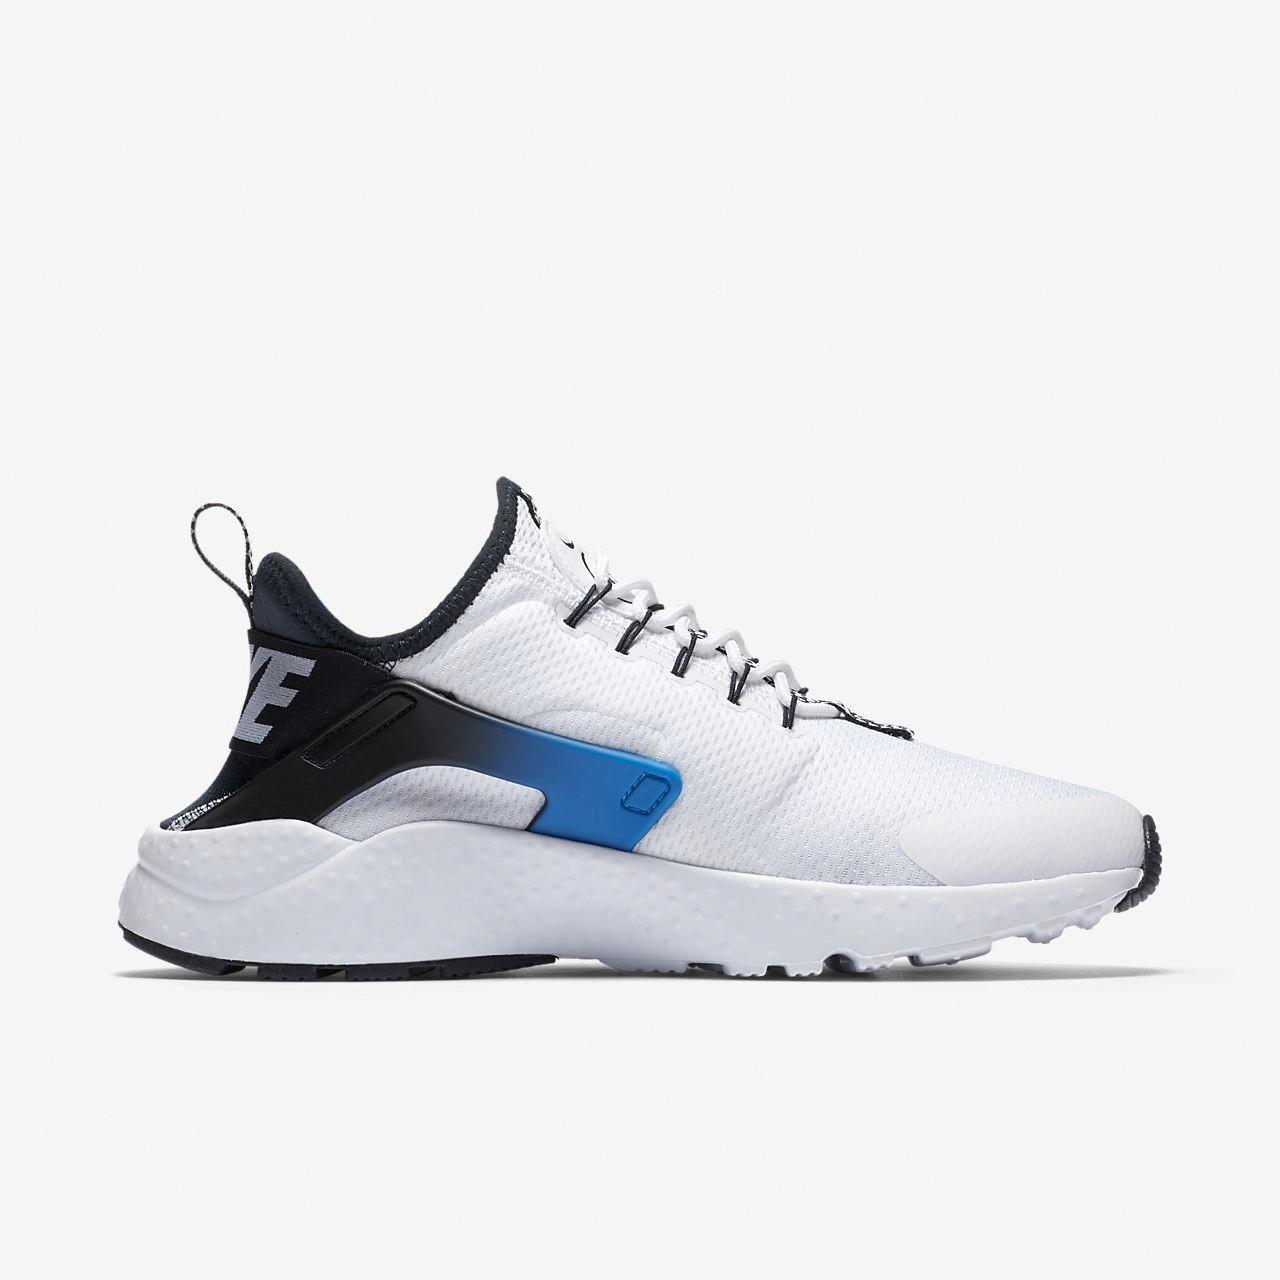 Nike Air Huarache Run Ultra N7 Women's Shoe 11.5 Blue